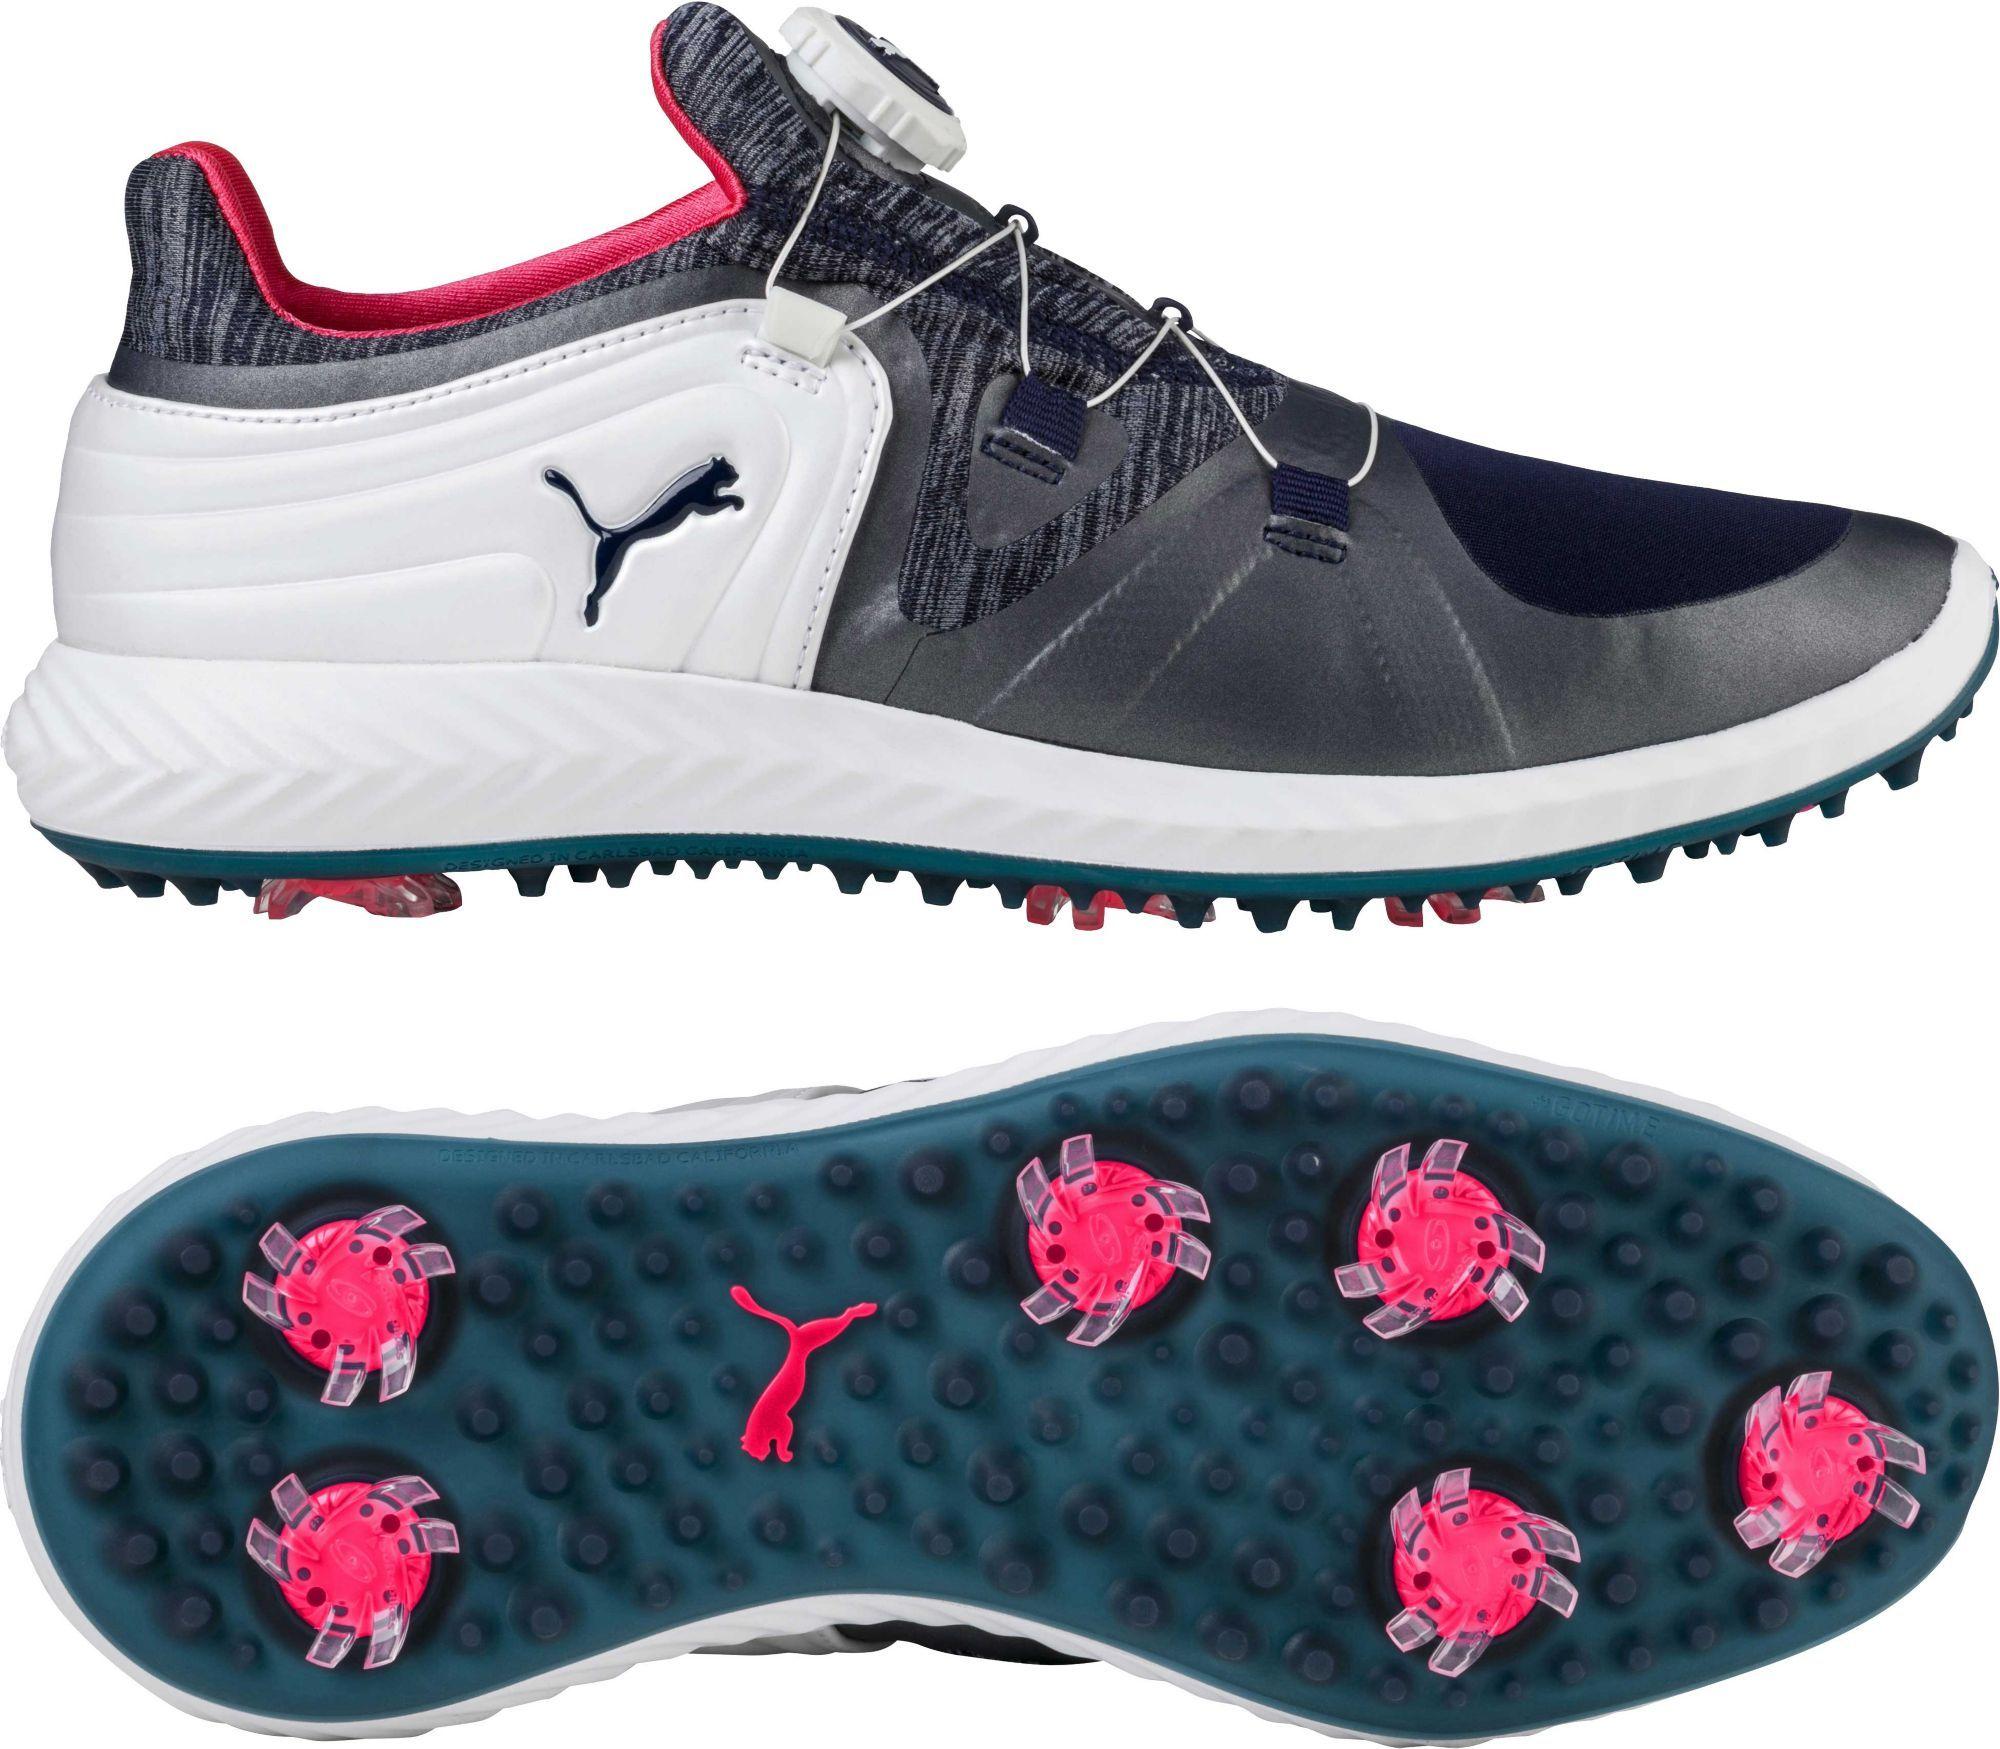 74851b1d Puma Women's Ignite Blaze Sport Disc Golf Shoes, Size: 5.5, Gray ...